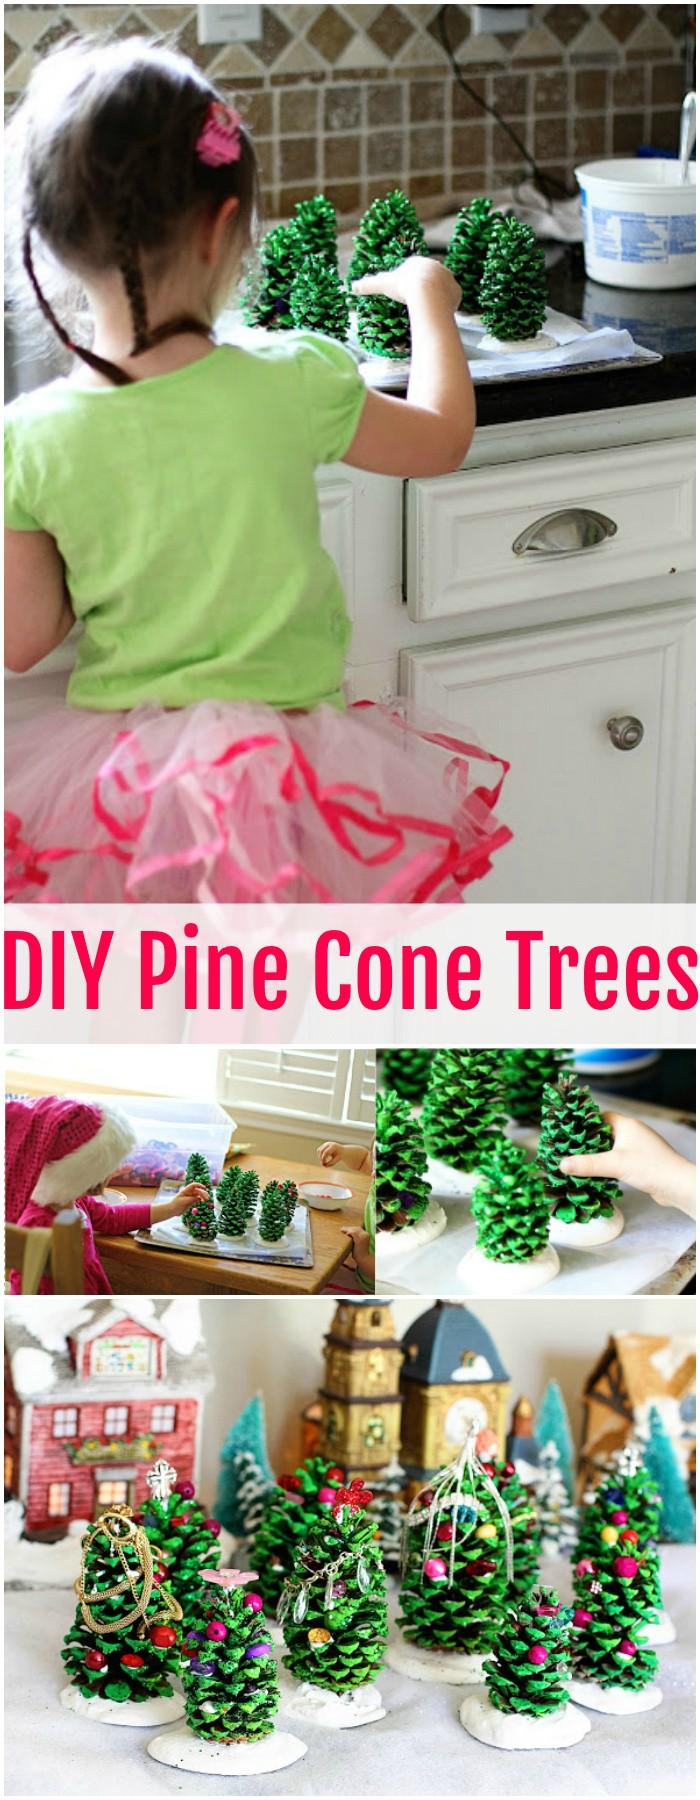 DIY Pine Cone Trees